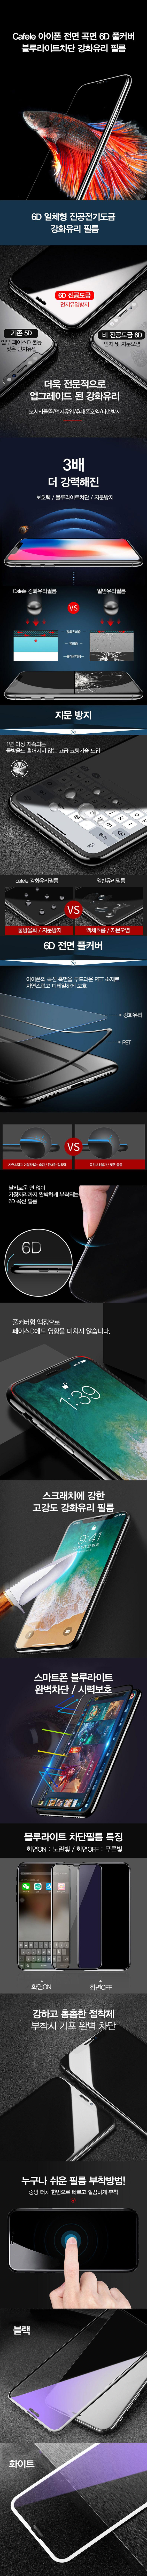 cafele 아이폰 전면 6D 곡면 풀커버 블루라이트차단 강화유리필름 - 카페레, 11,900원, 필름/스킨, 아이폰XS